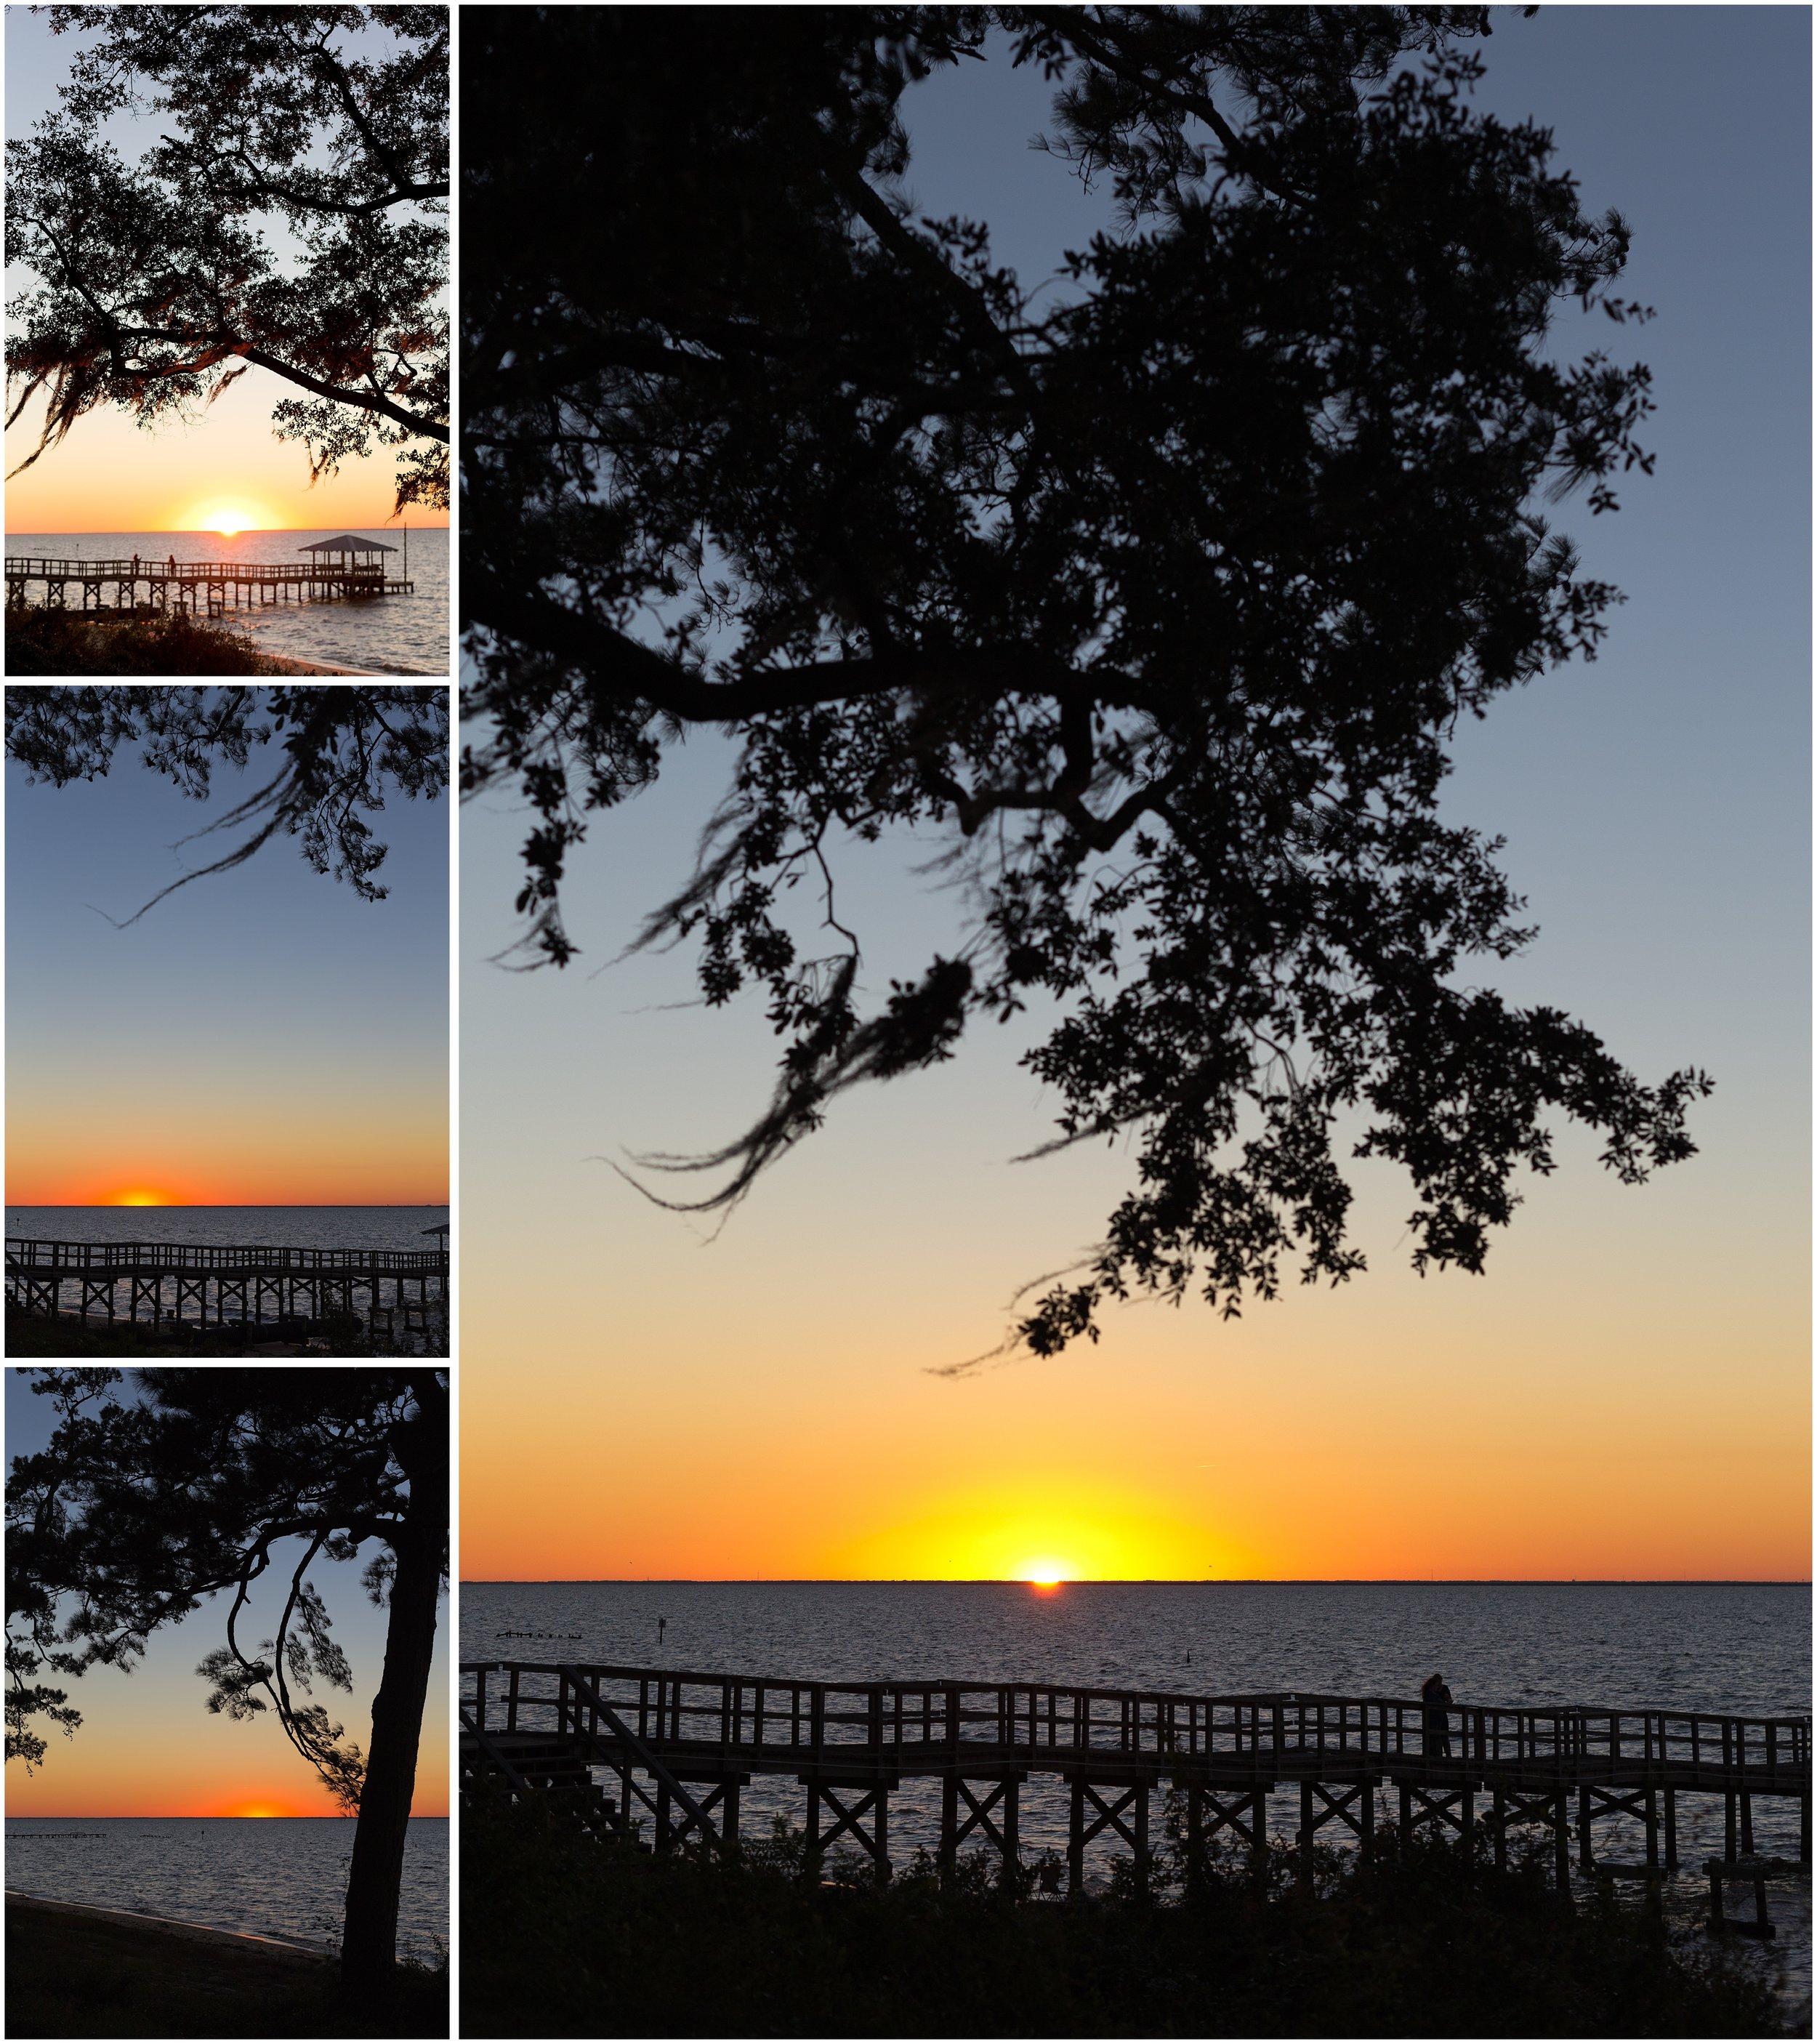 sunset in Fairhope, Alabama